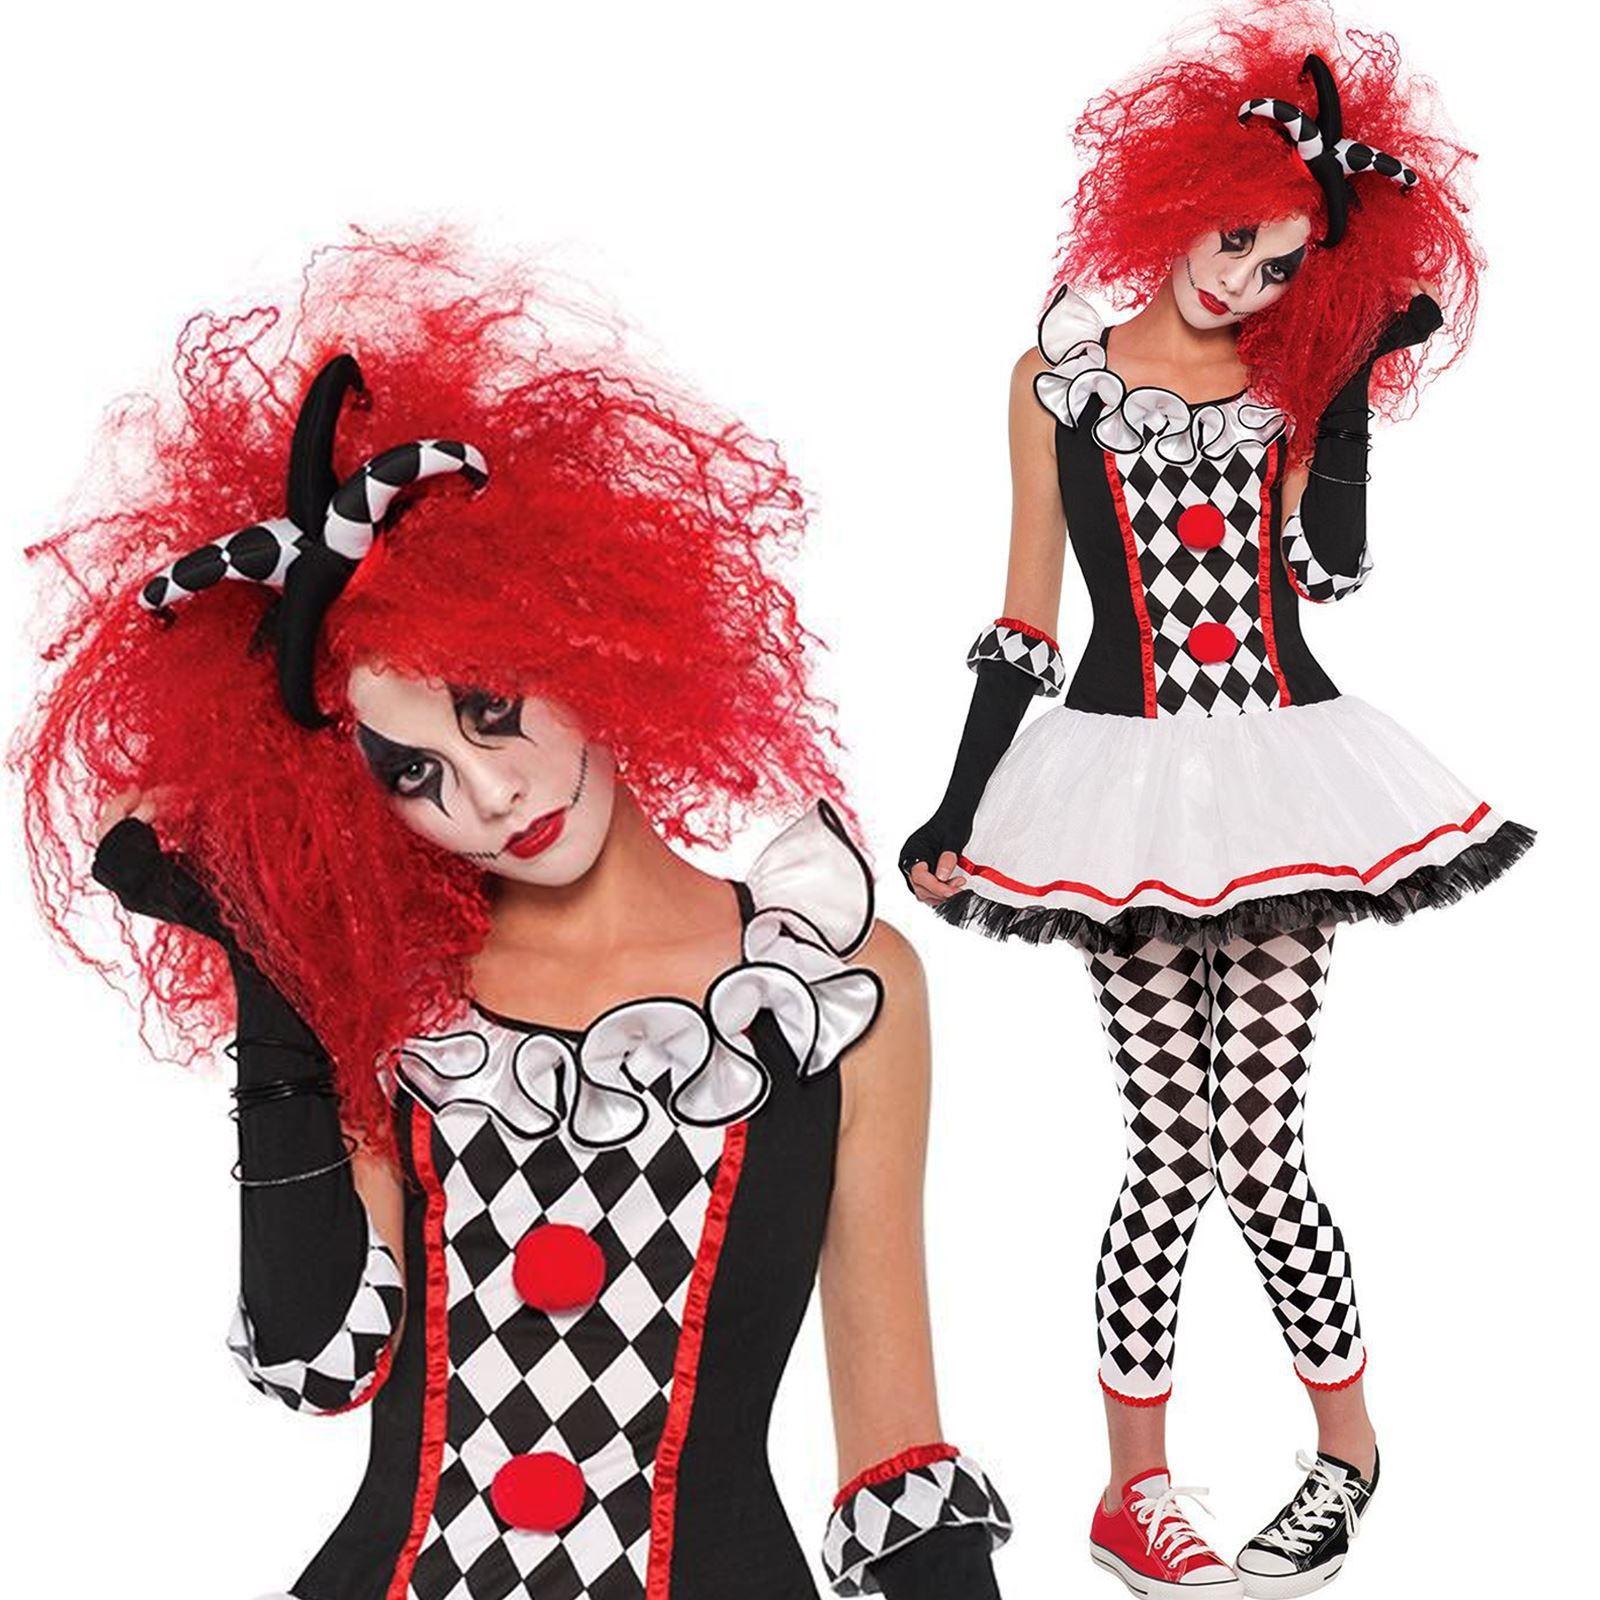 femmes clown arlequin miel bouffon halloween d guisement costume tenue ebay. Black Bedroom Furniture Sets. Home Design Ideas